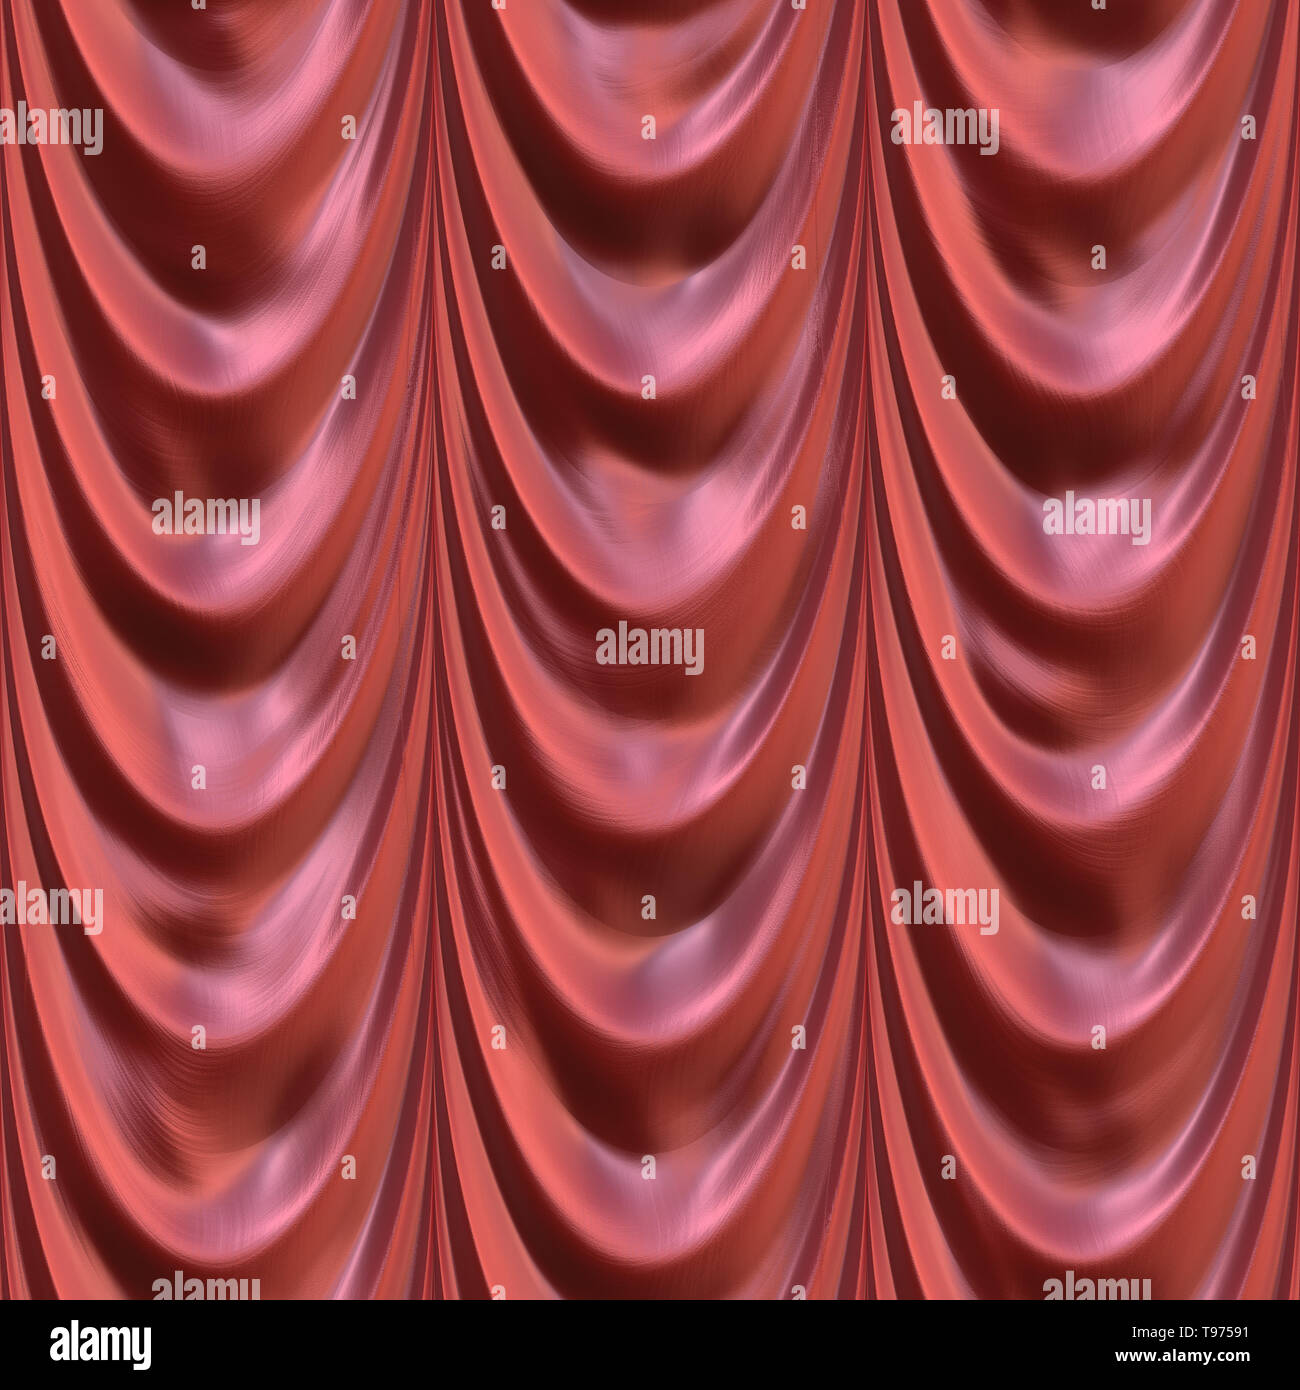 Drapery Seamless Texture Tile - Stock Image